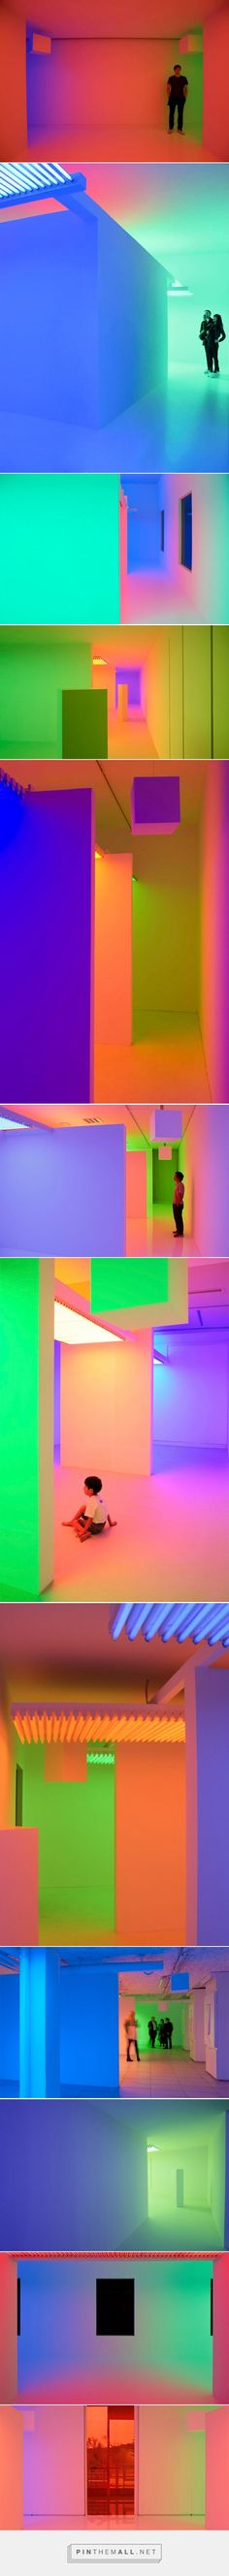 Chromosaturation: Interactive Art Installations by Carlos Cruz-Diez   Inspiration Grid